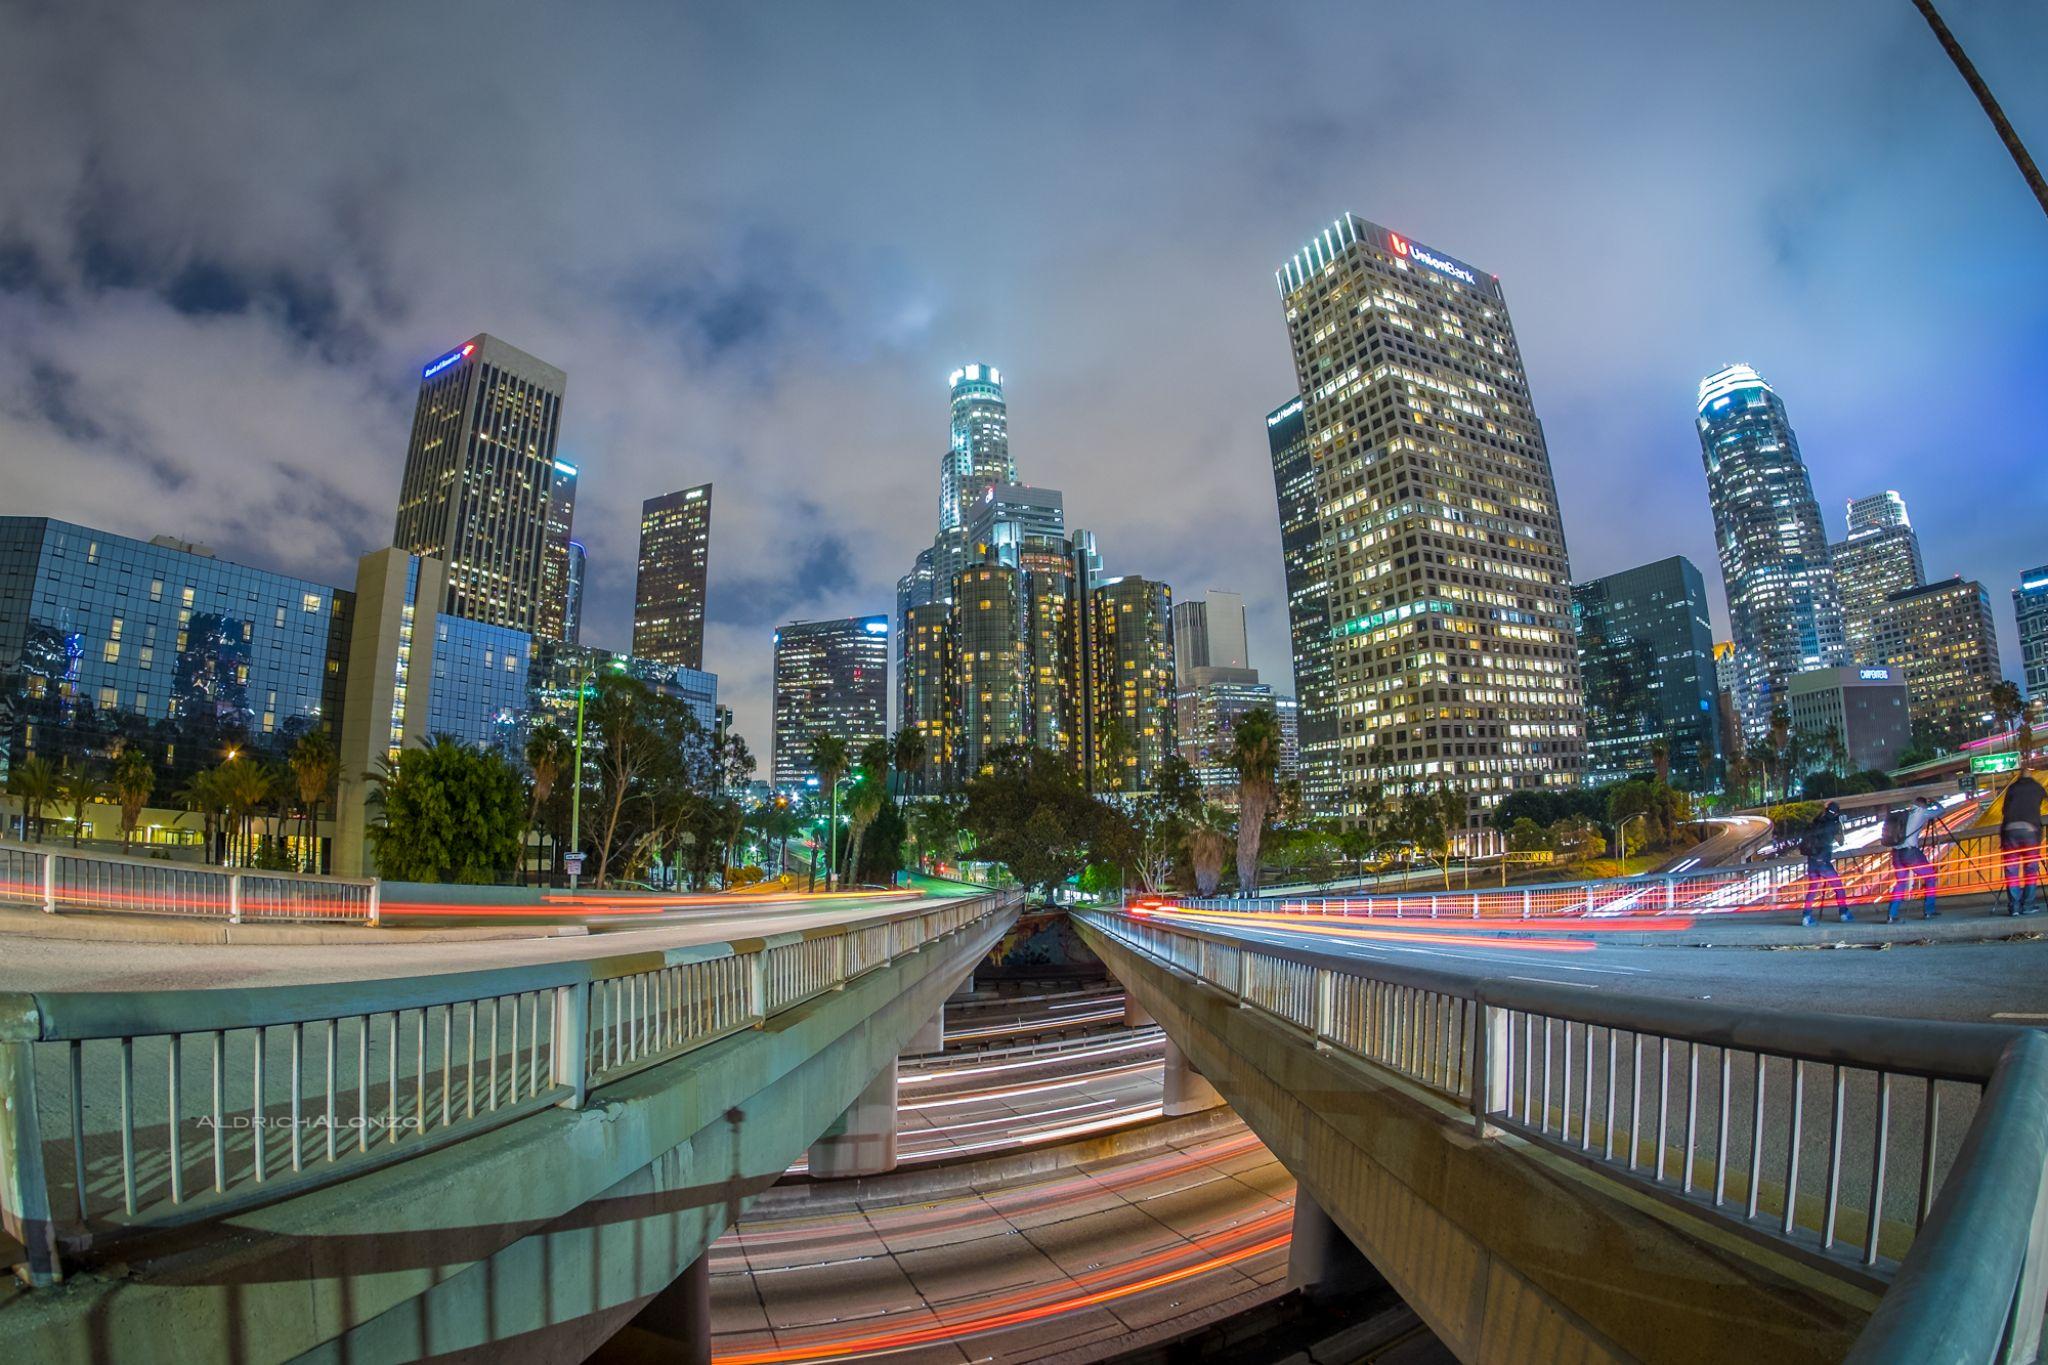 Los Angeles by Aldrich Alonzo